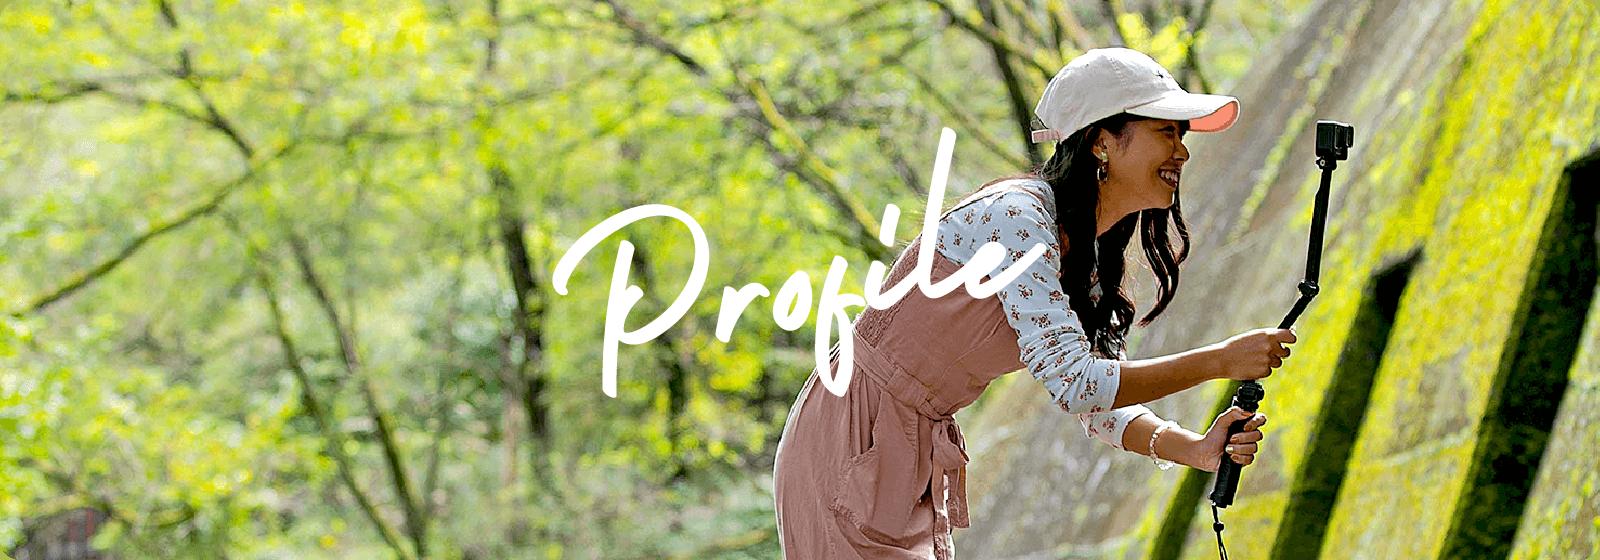 Profile|アミロハ